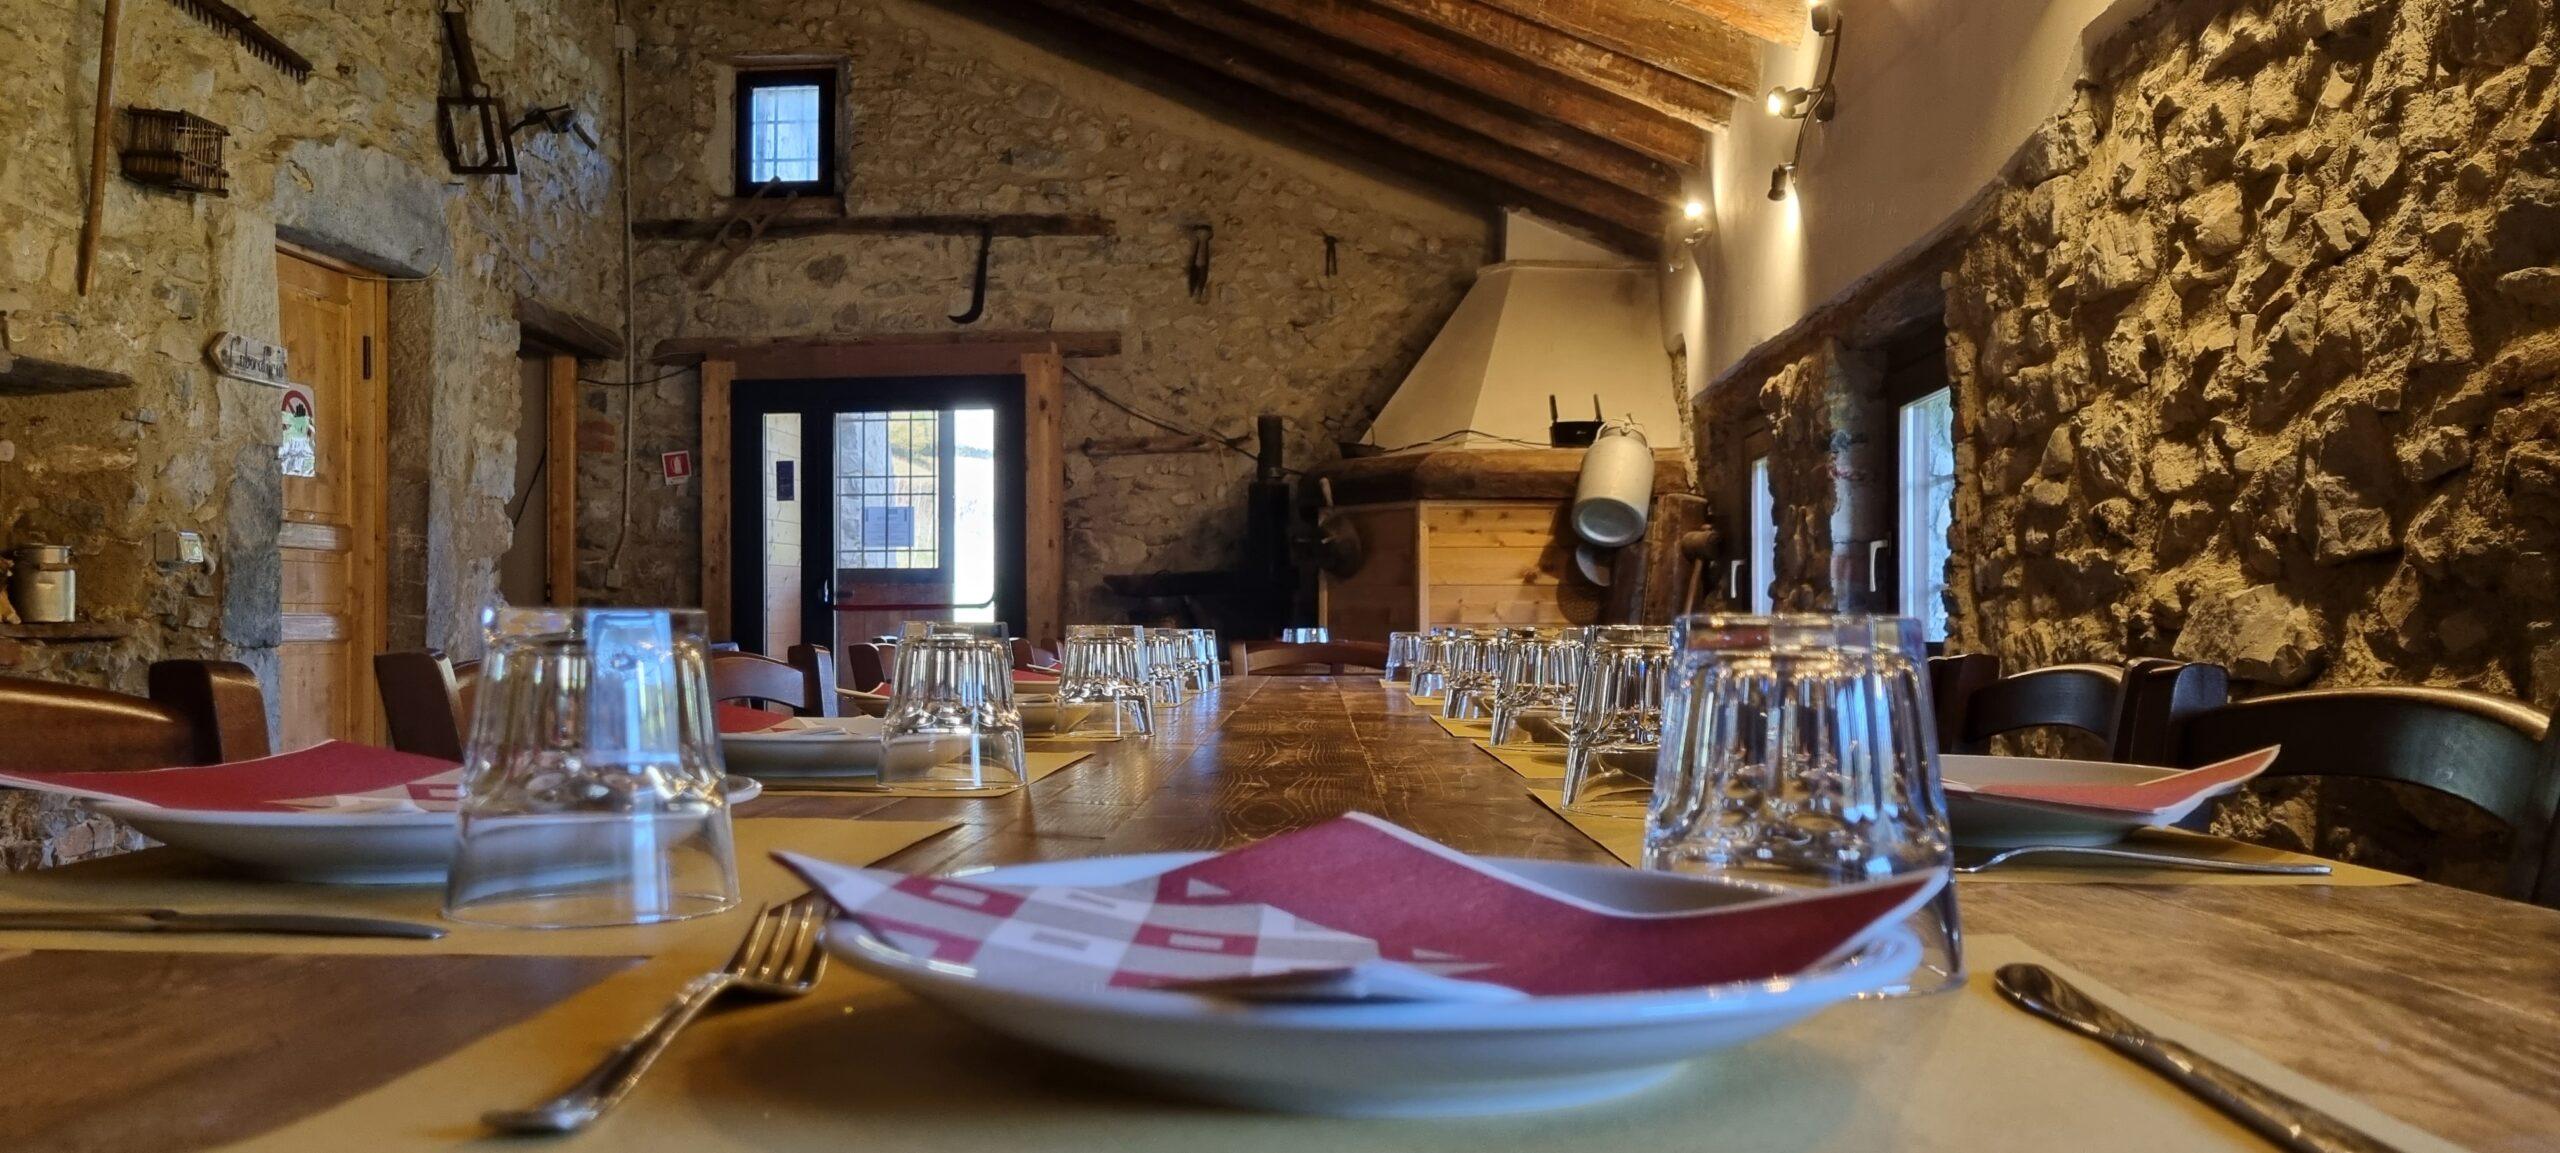 Autunno in tavola: pranzo a tappe